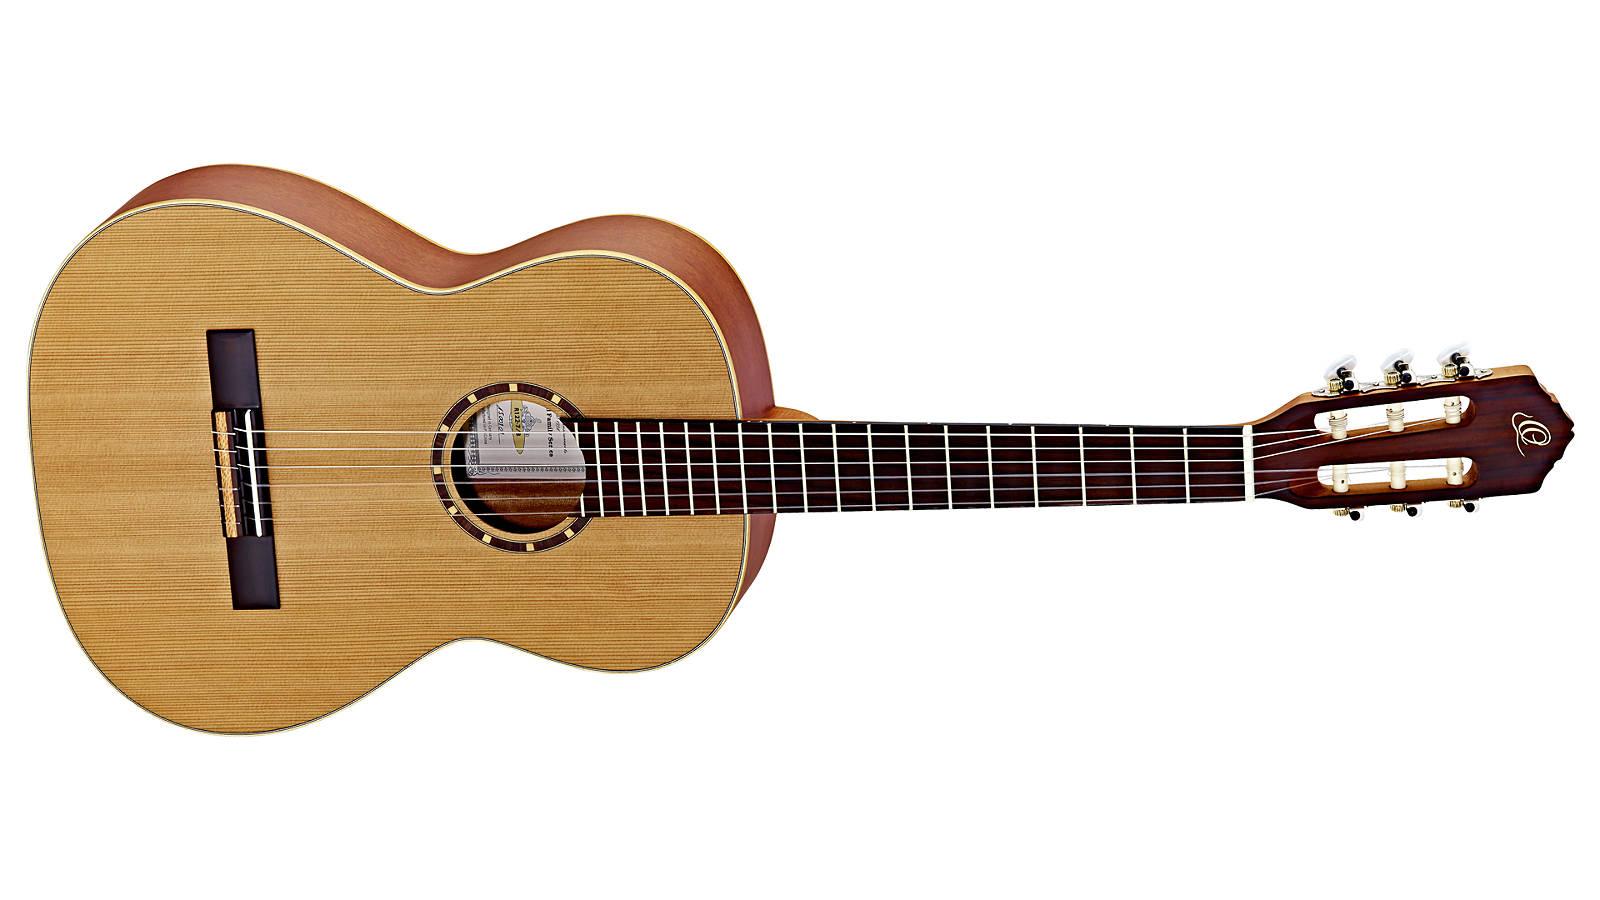 Ortega R122-7/8 Konzertgitarre